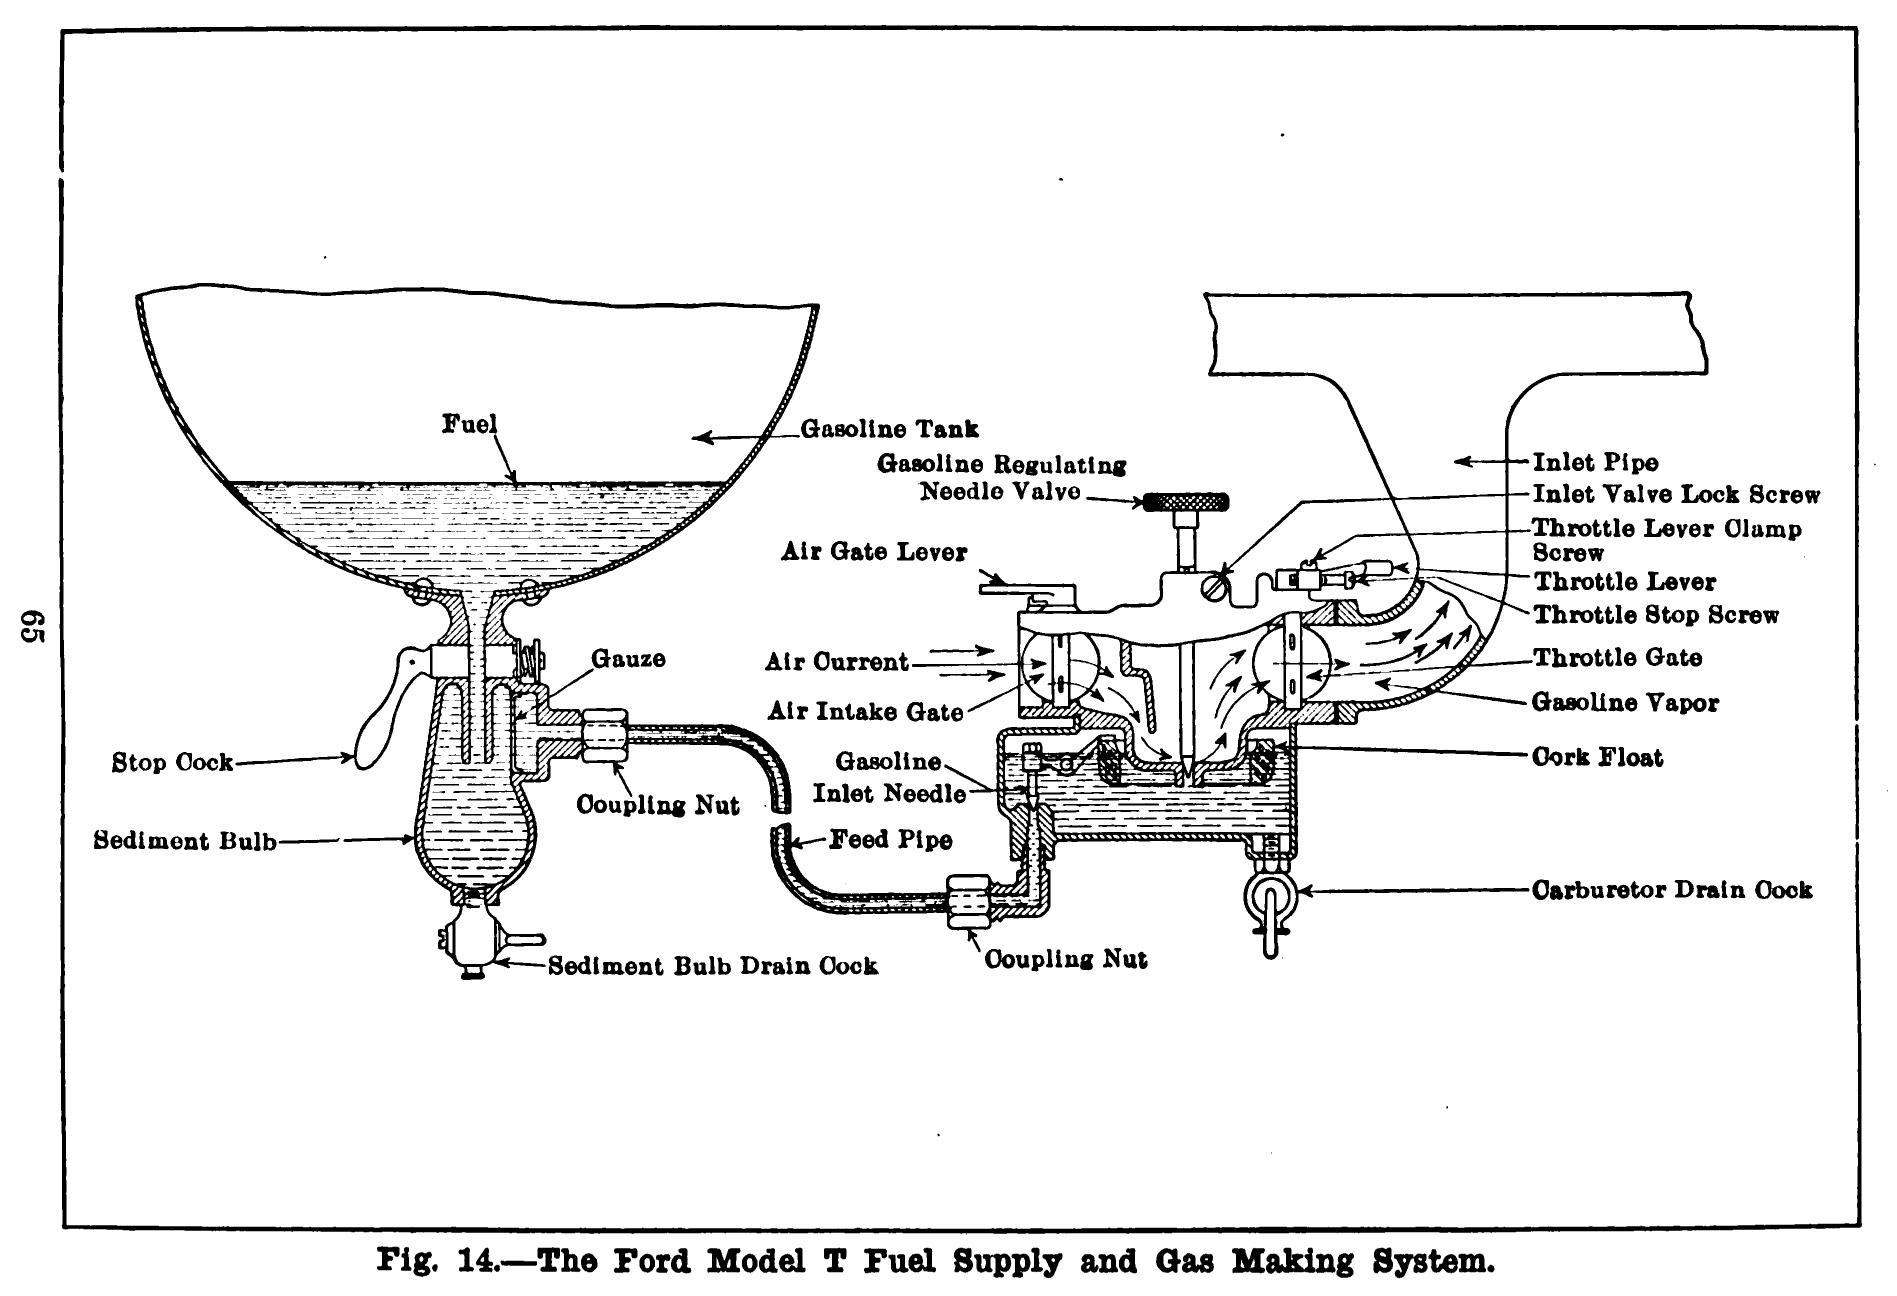 Model T Ford Car Figure 14